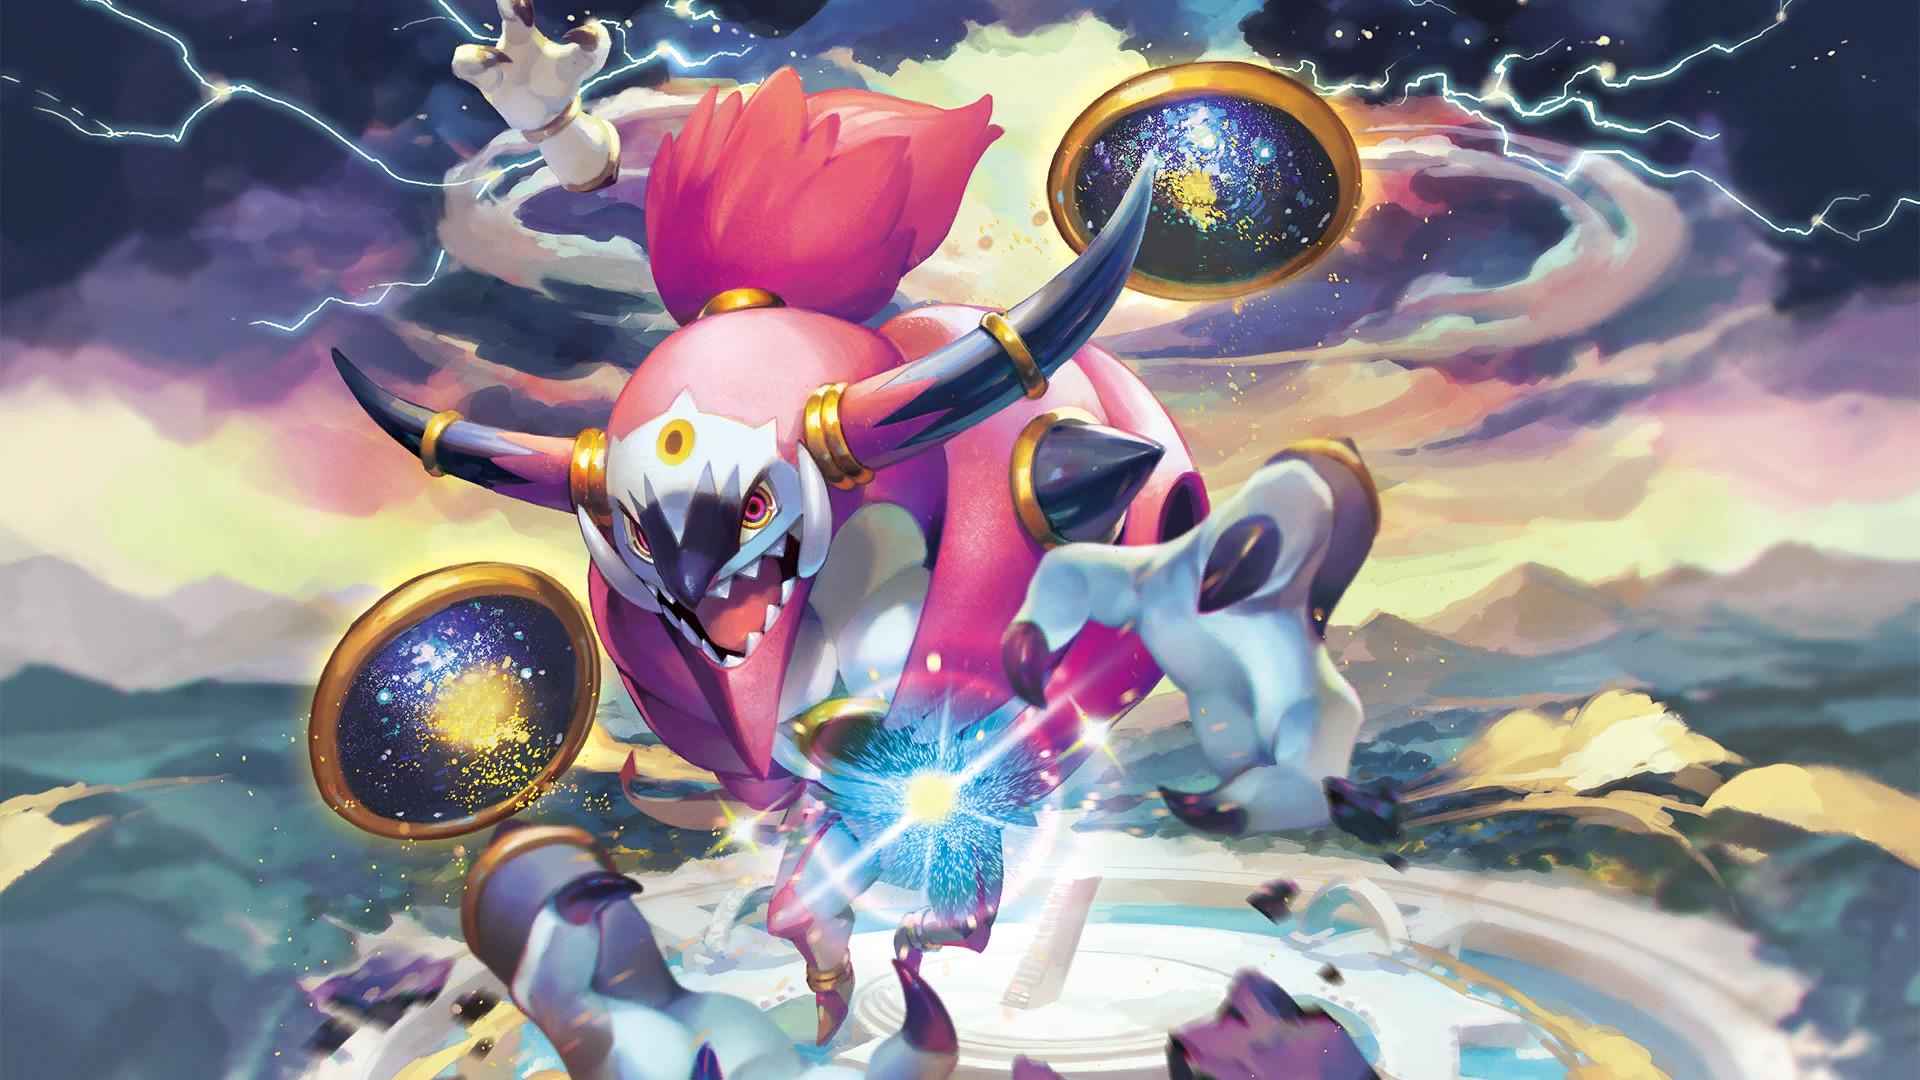 Image РMega Hoopa Pokemon TCG XY Ancient Origins.png   Pok̩mon Wiki    FANDOM powered by Wikia